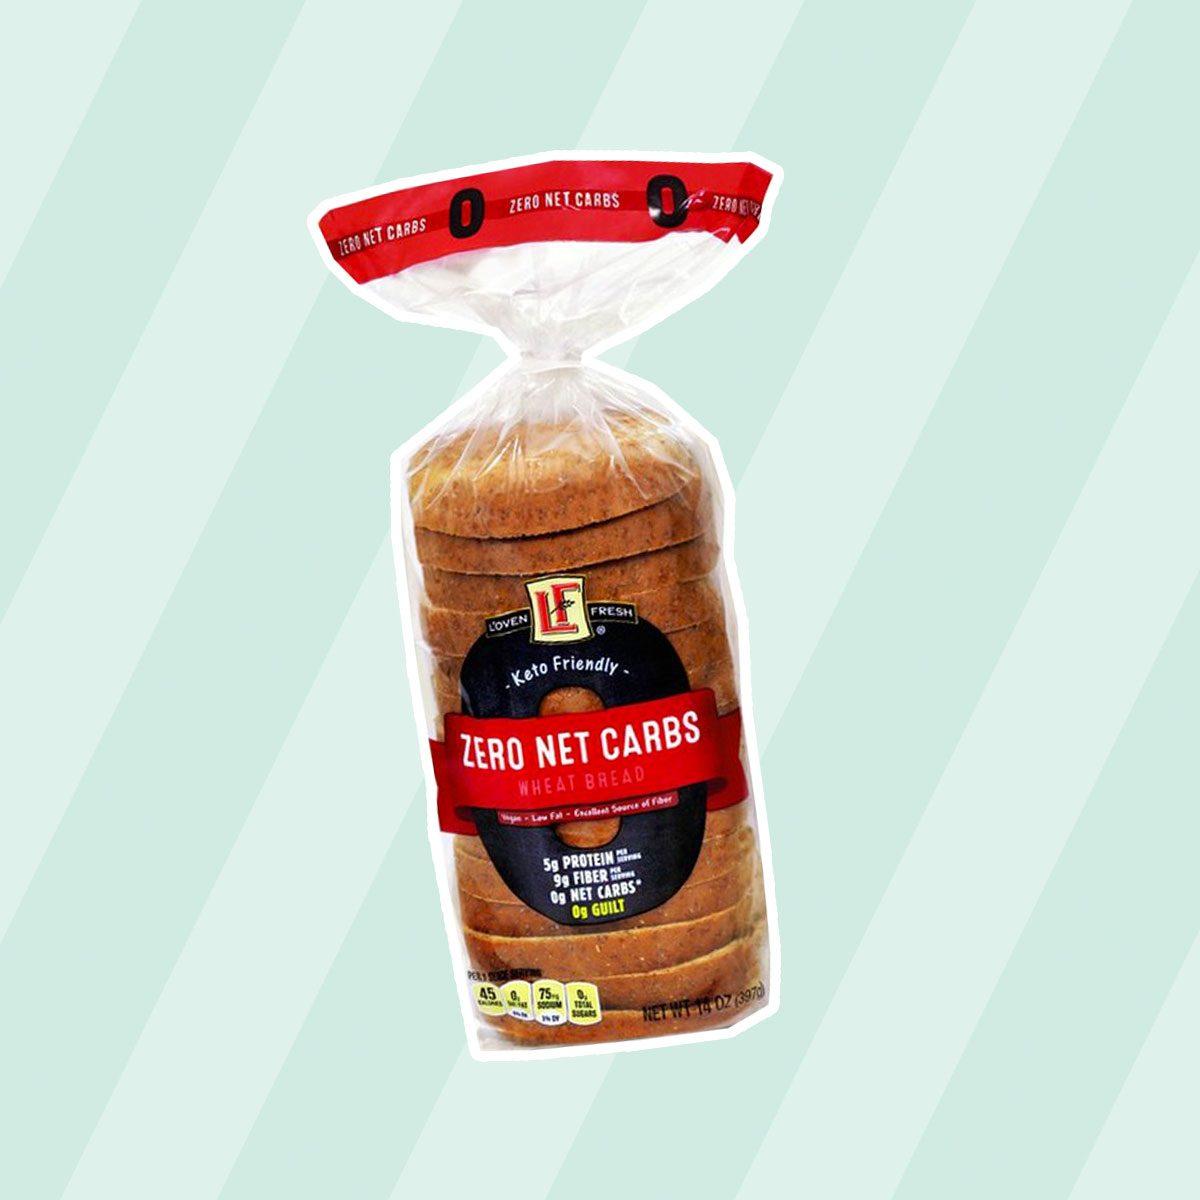 Loven Fresh Zero Net Carbs Bread